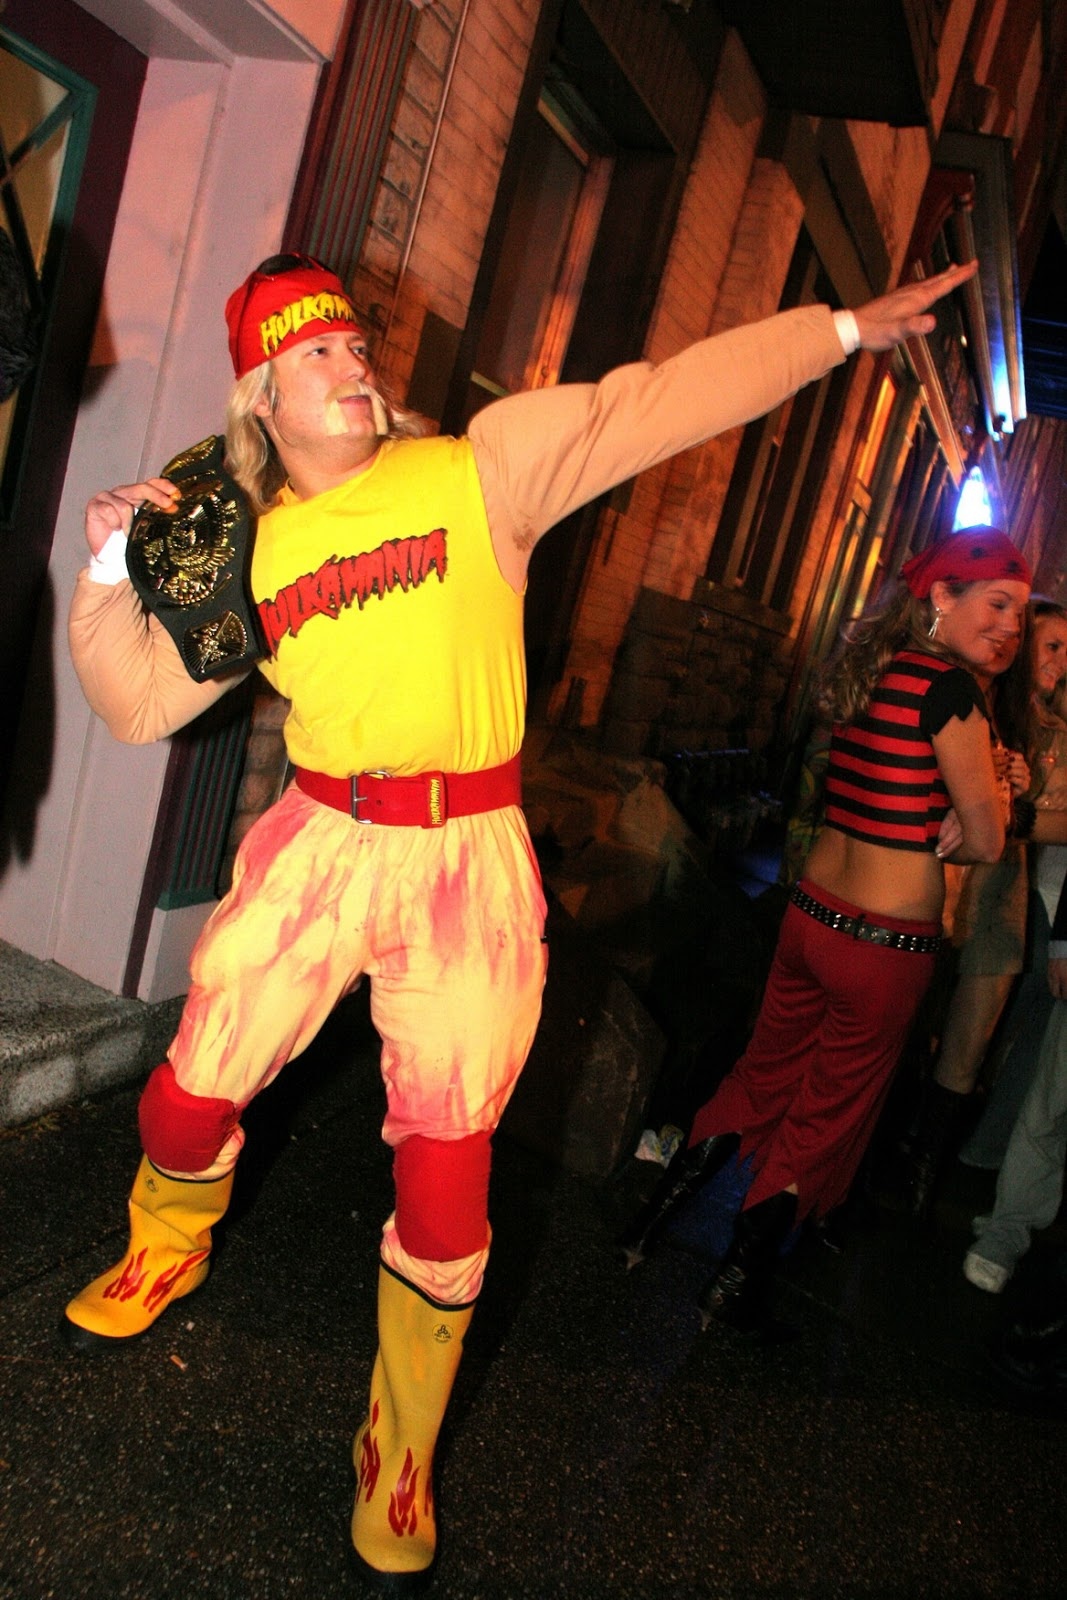 Dukes of Hazzard Collector & Dukes of Hazzard Collector: Larryu0027s Halloween Costumes